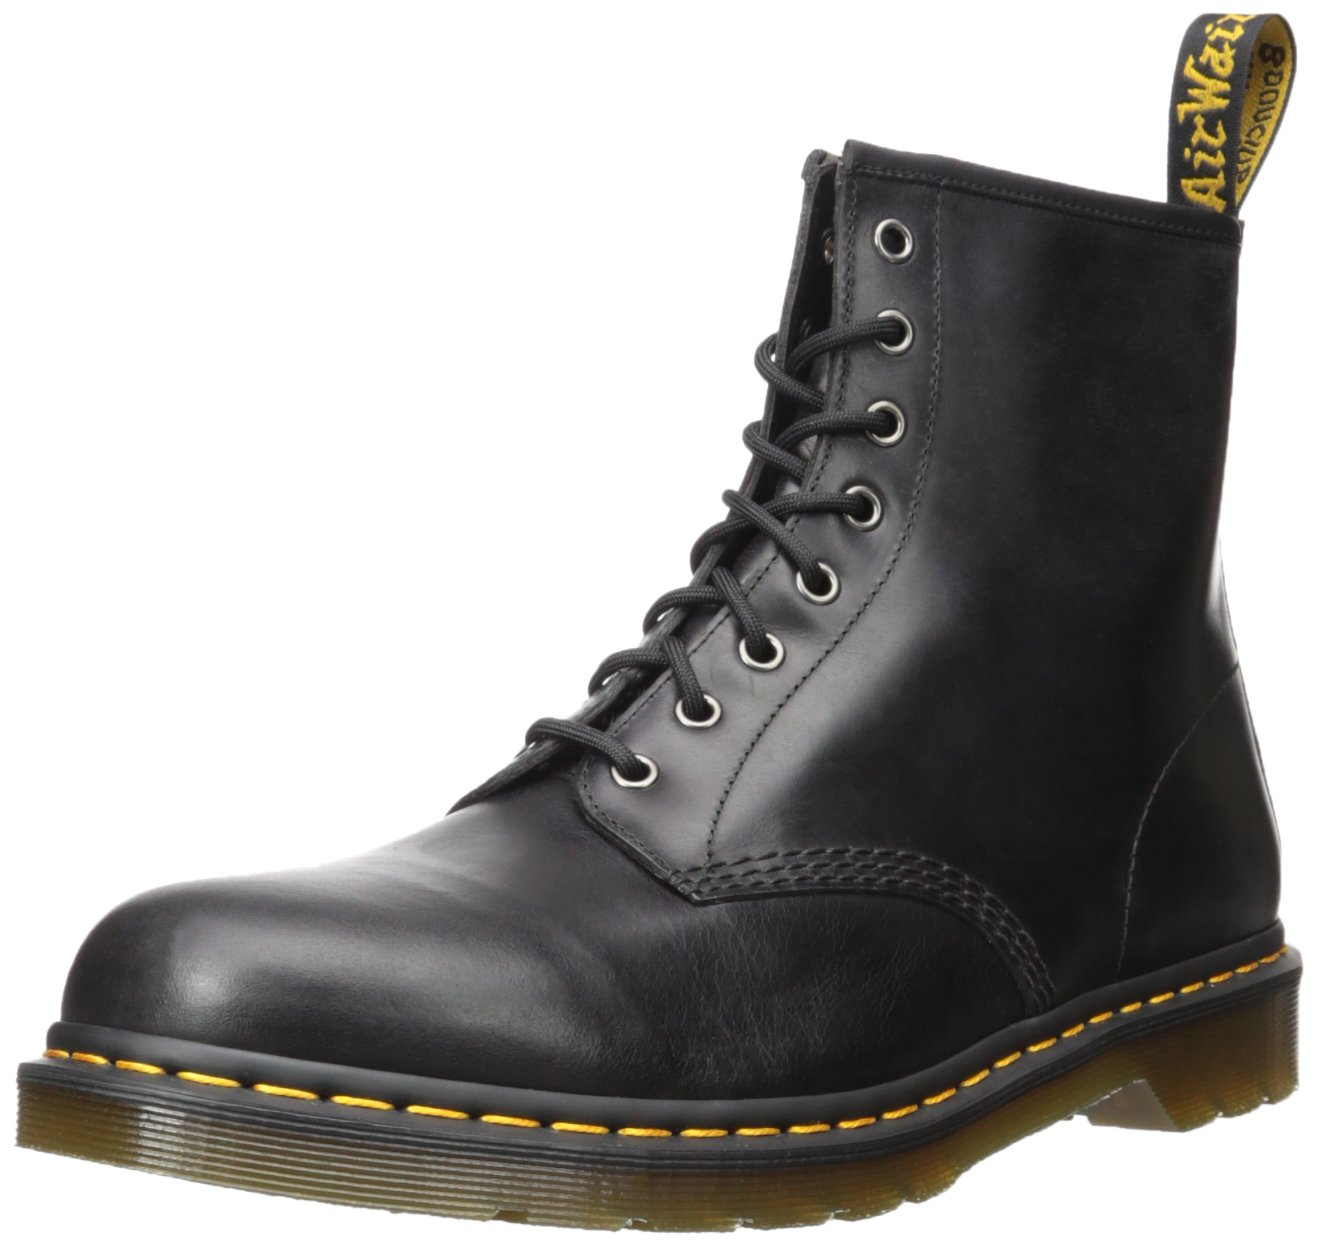 Dr.Martens Mens 1460 8 Eyelet Gunmetal Leather Boots 43 EU 43 EU|Carbón